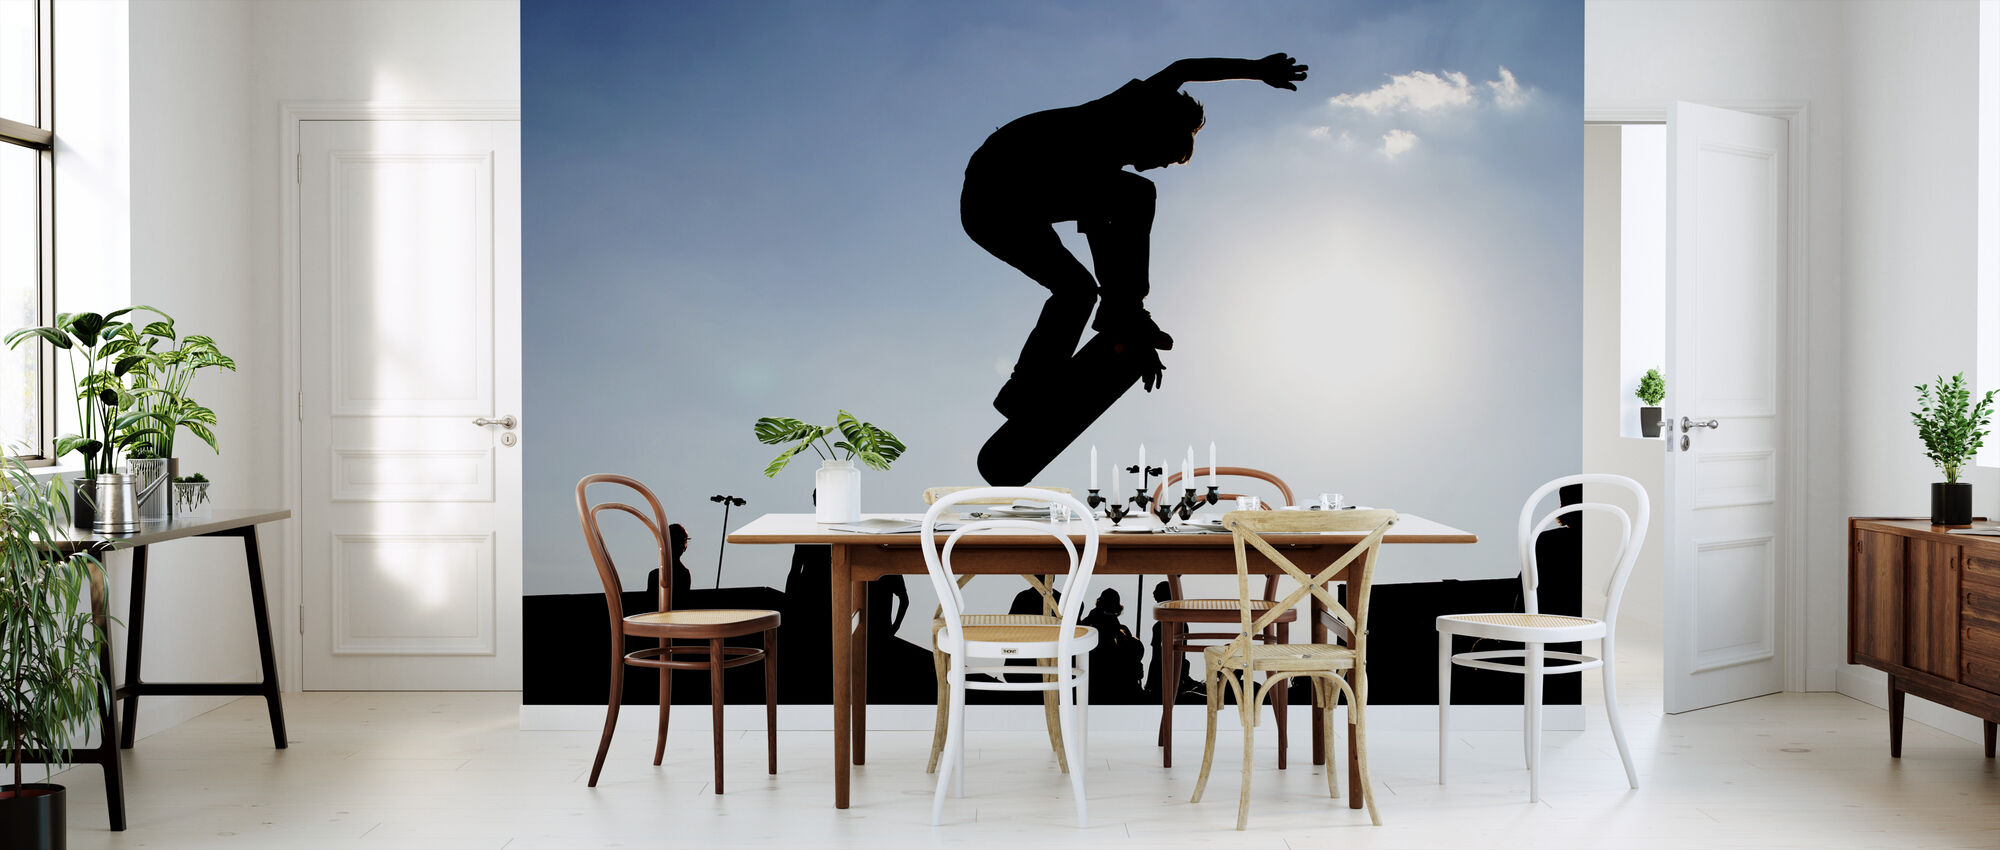 skateboard jump beliebte fototapete photowall. Black Bedroom Furniture Sets. Home Design Ideas